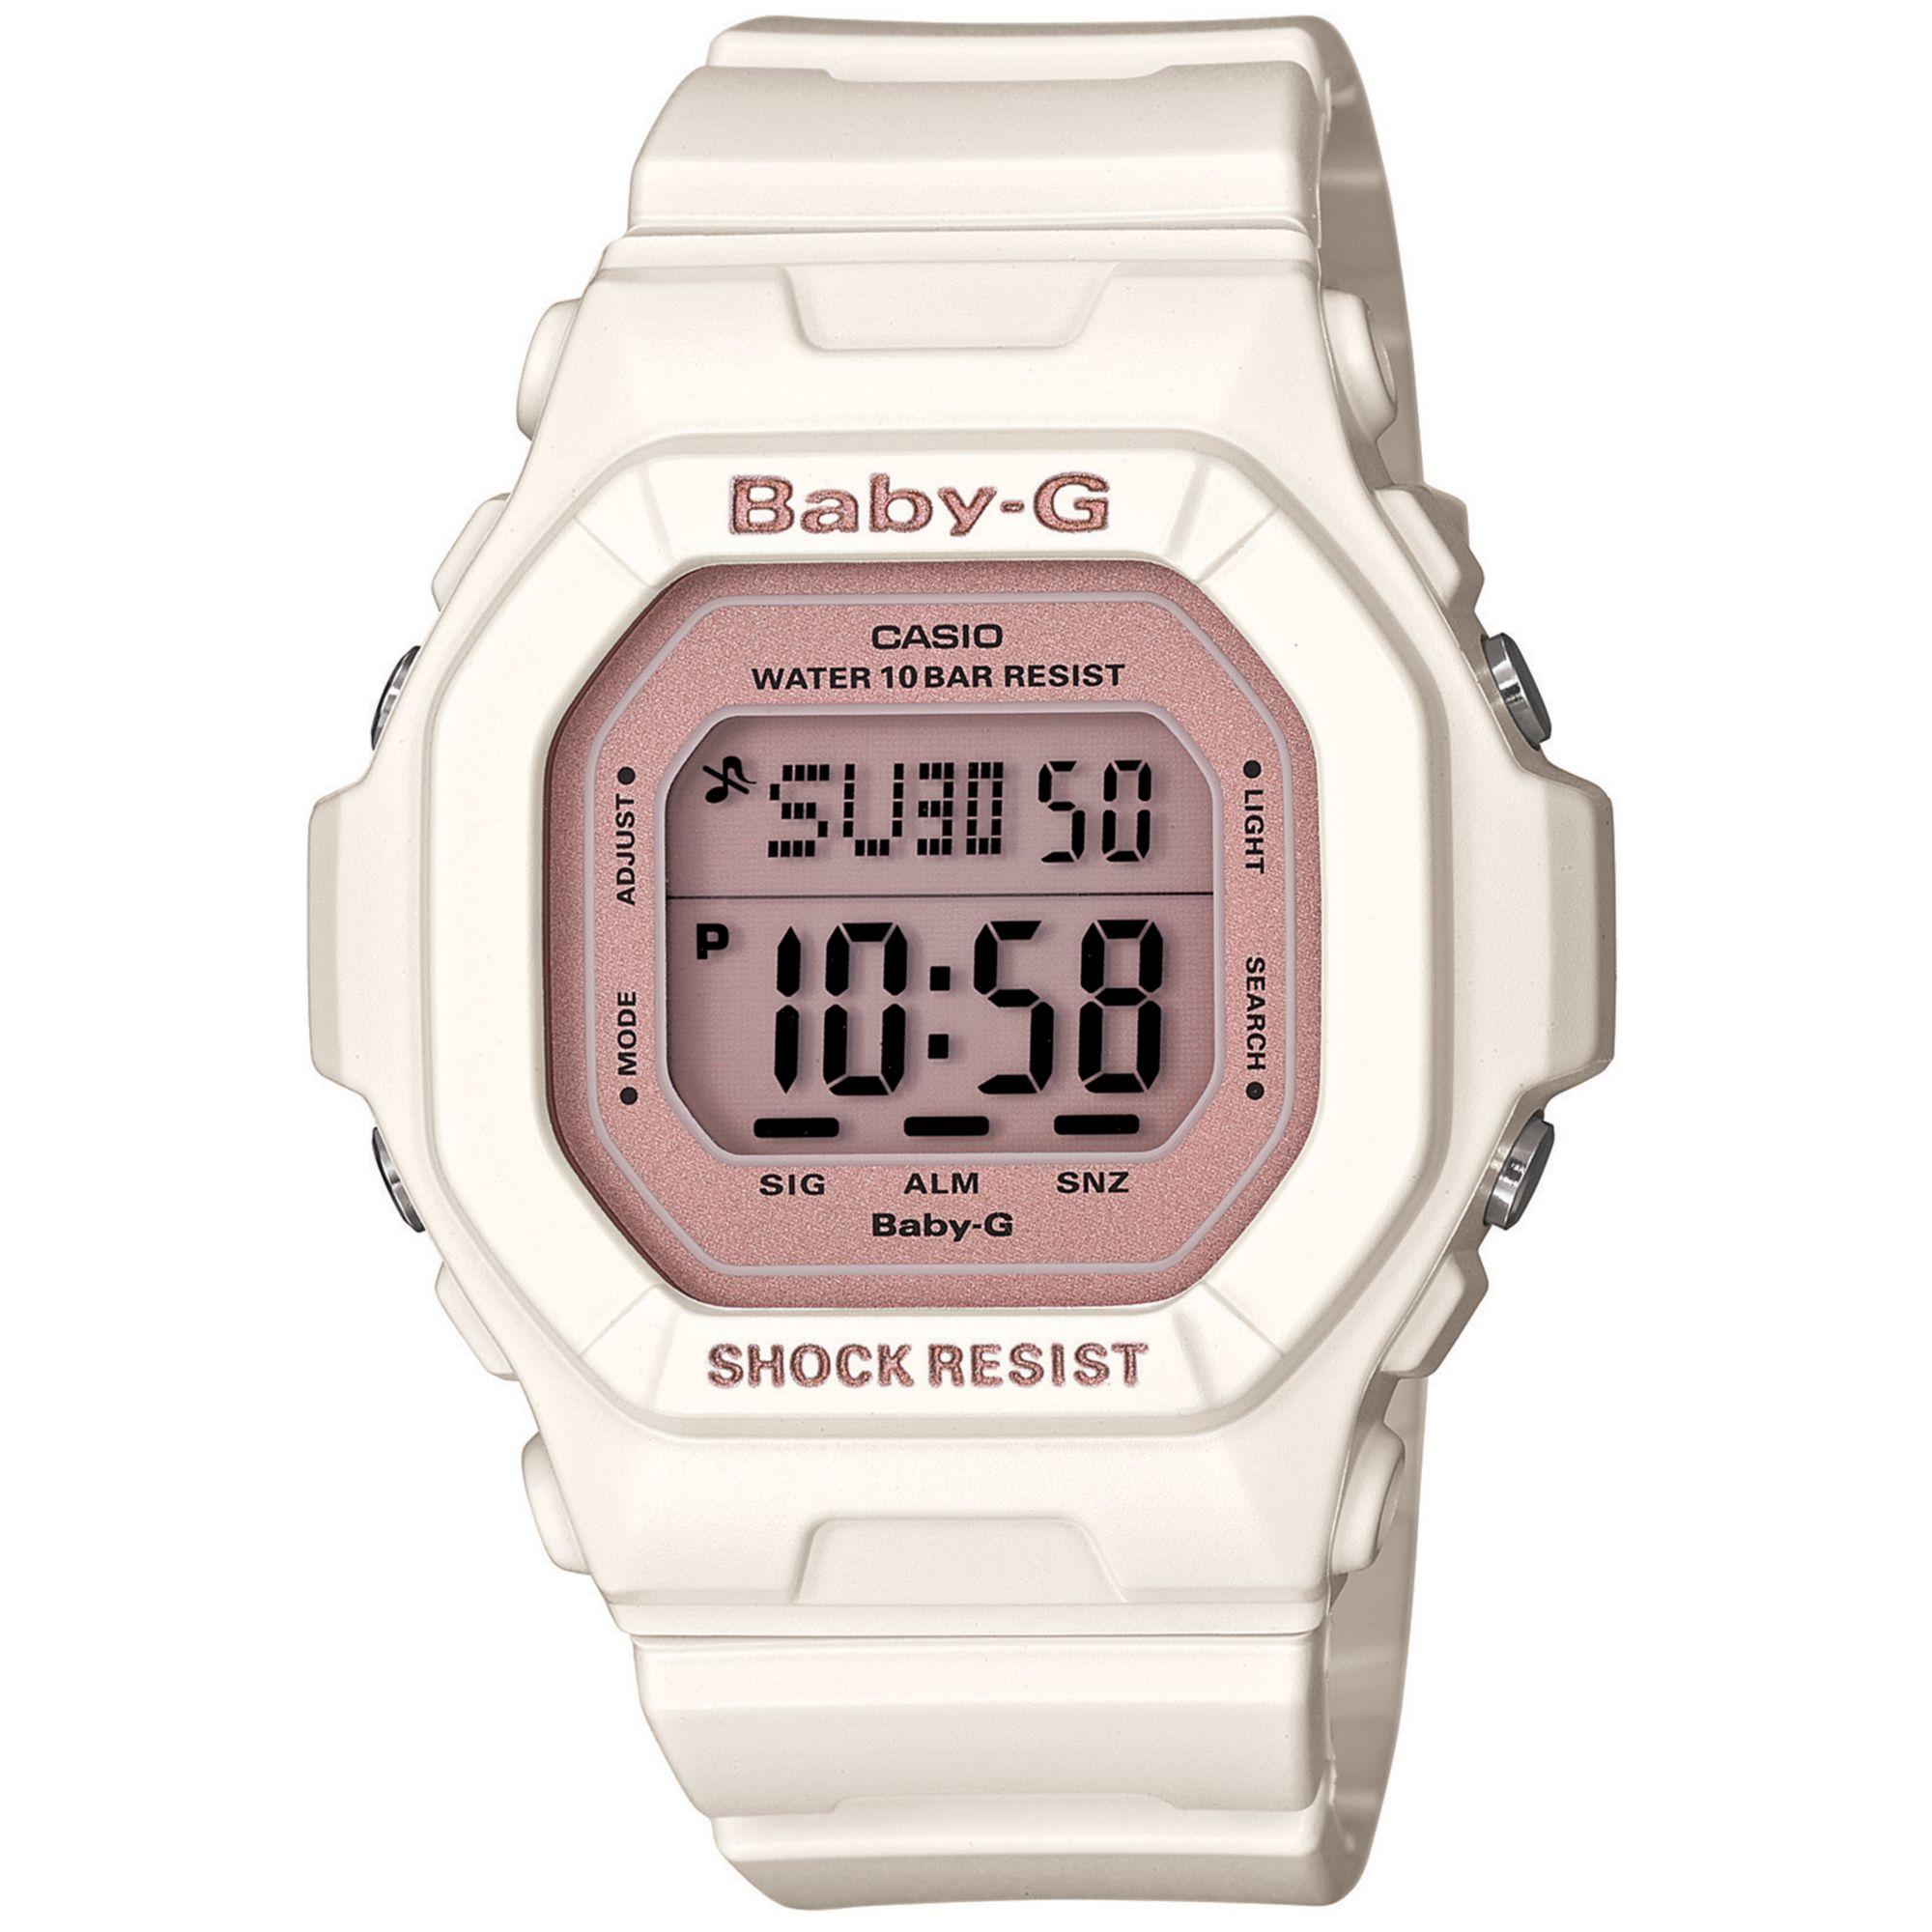 d49bbe55e G-Shock Babyg Watch Womens Digital Cream Resin Strap 40x43mm in ...